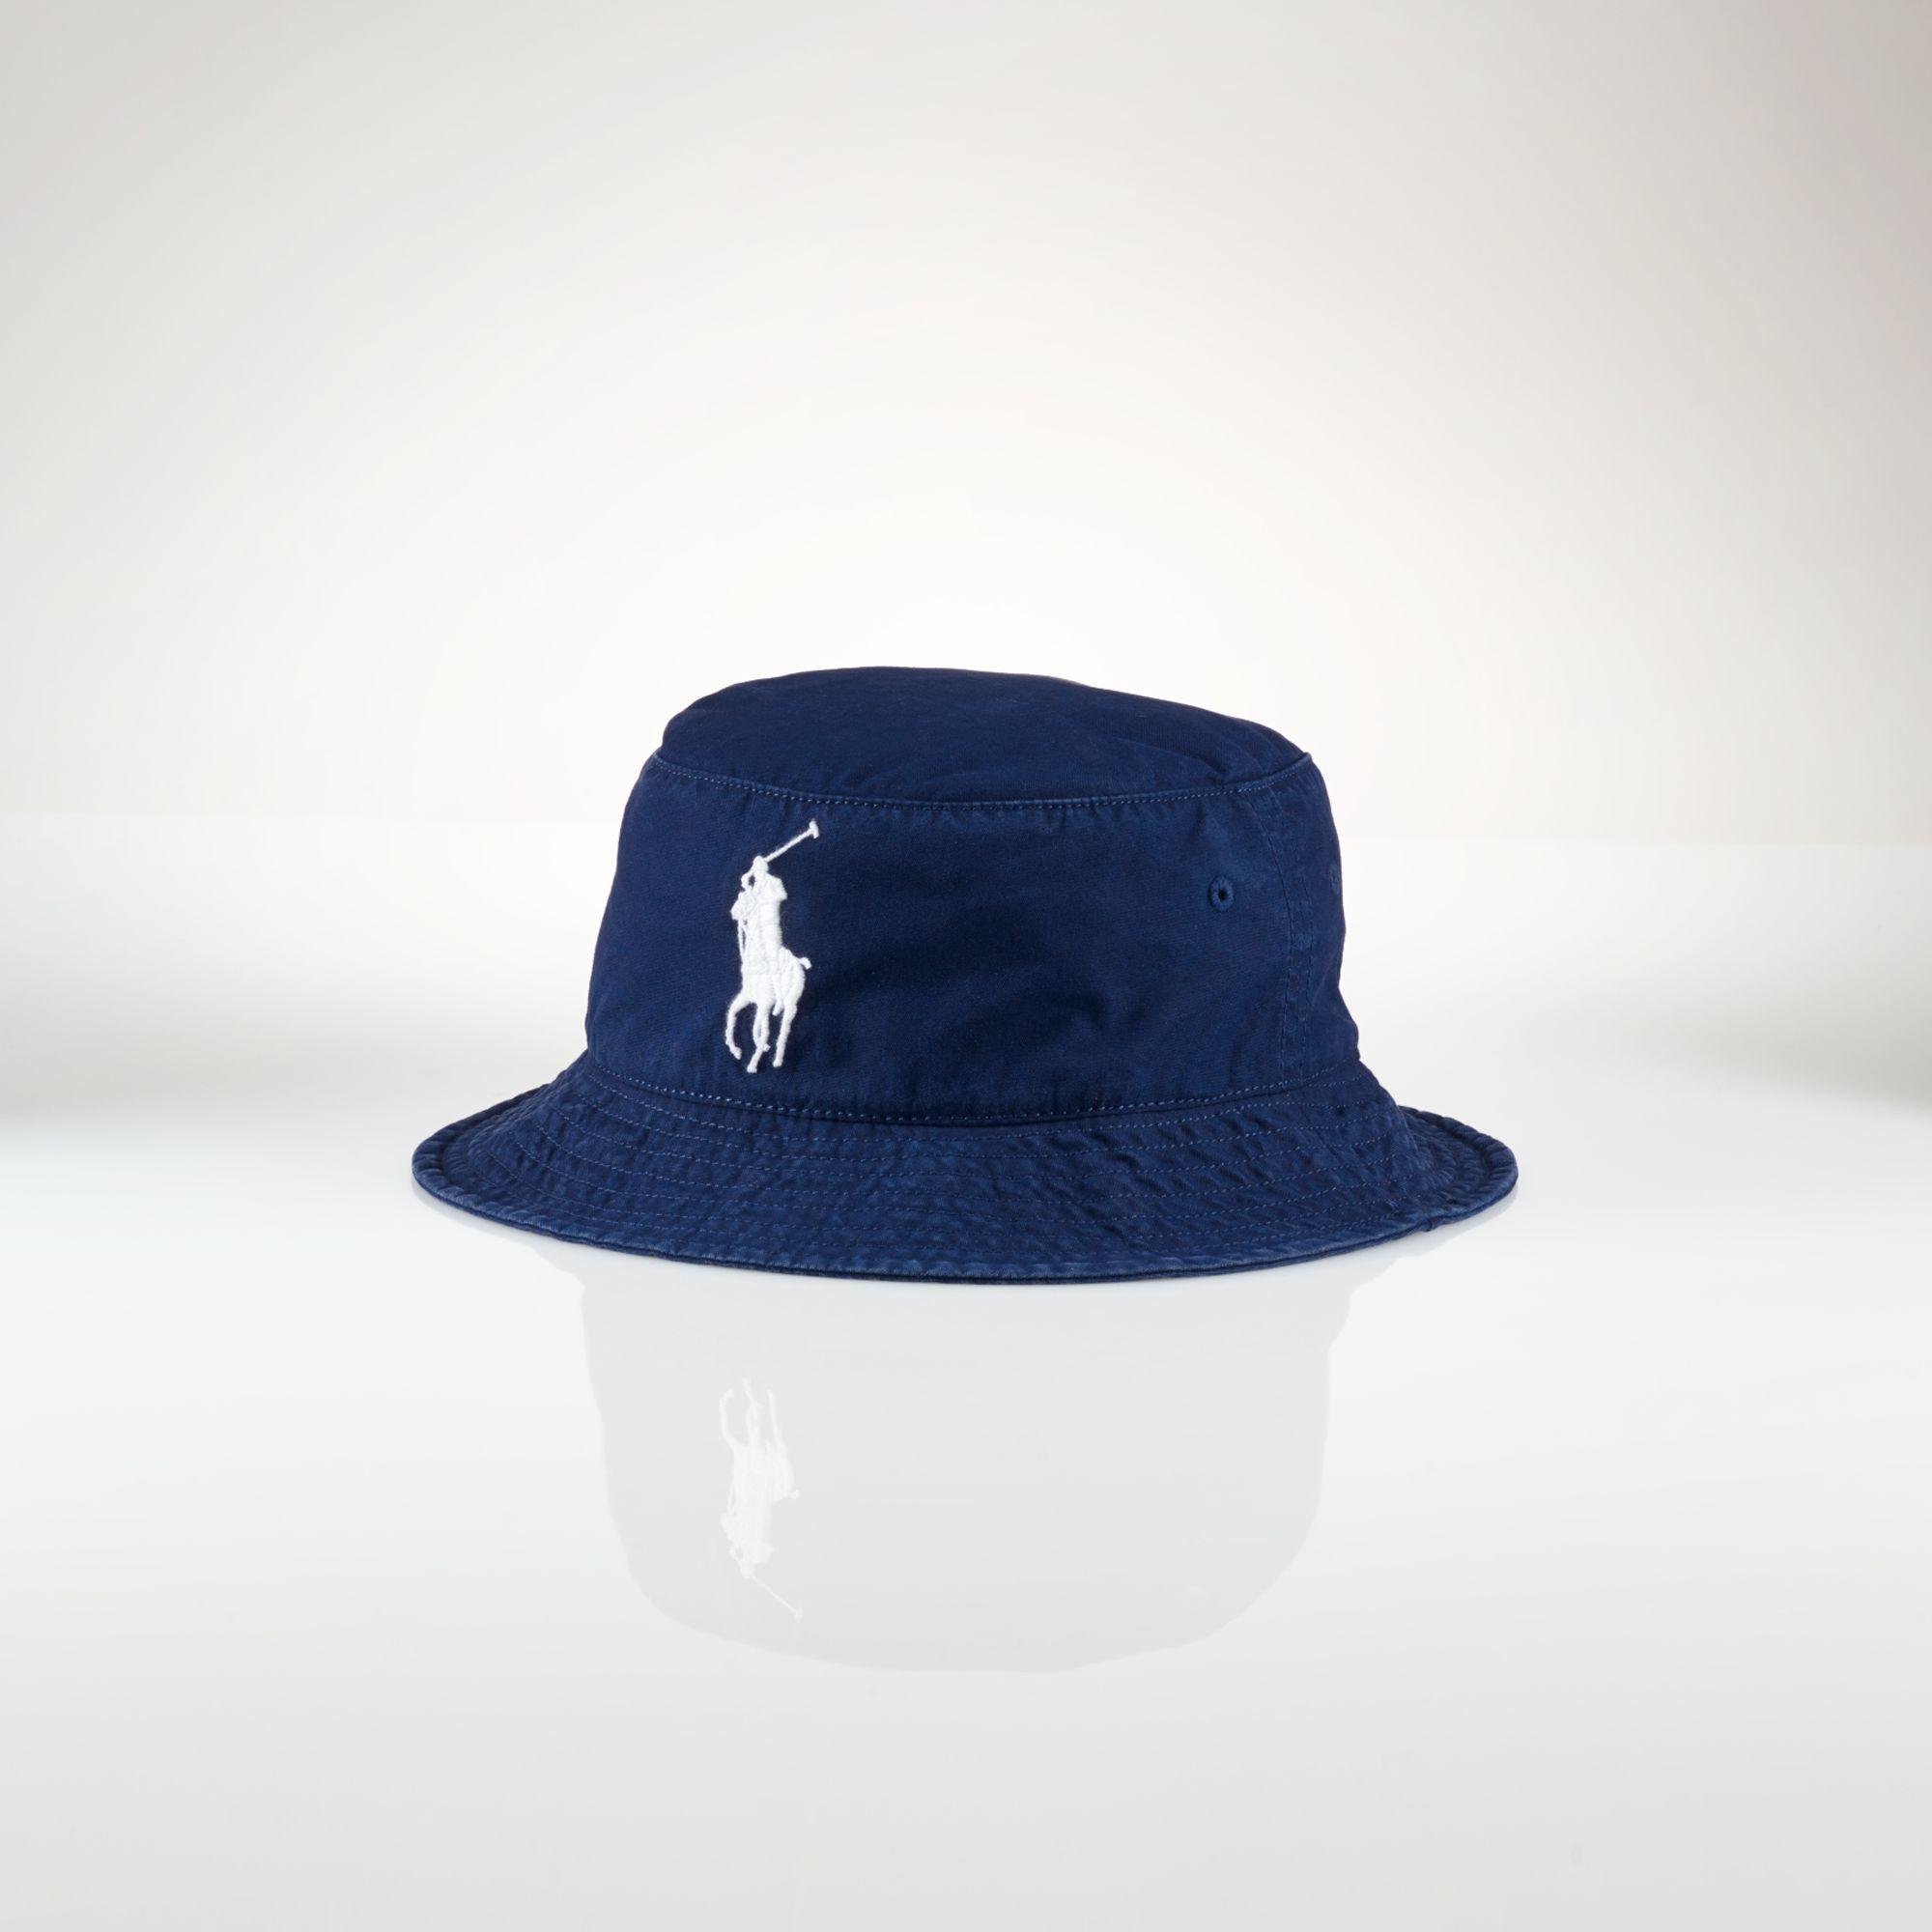 polo ralph lauren beachside bucket hat in blue for men lyst